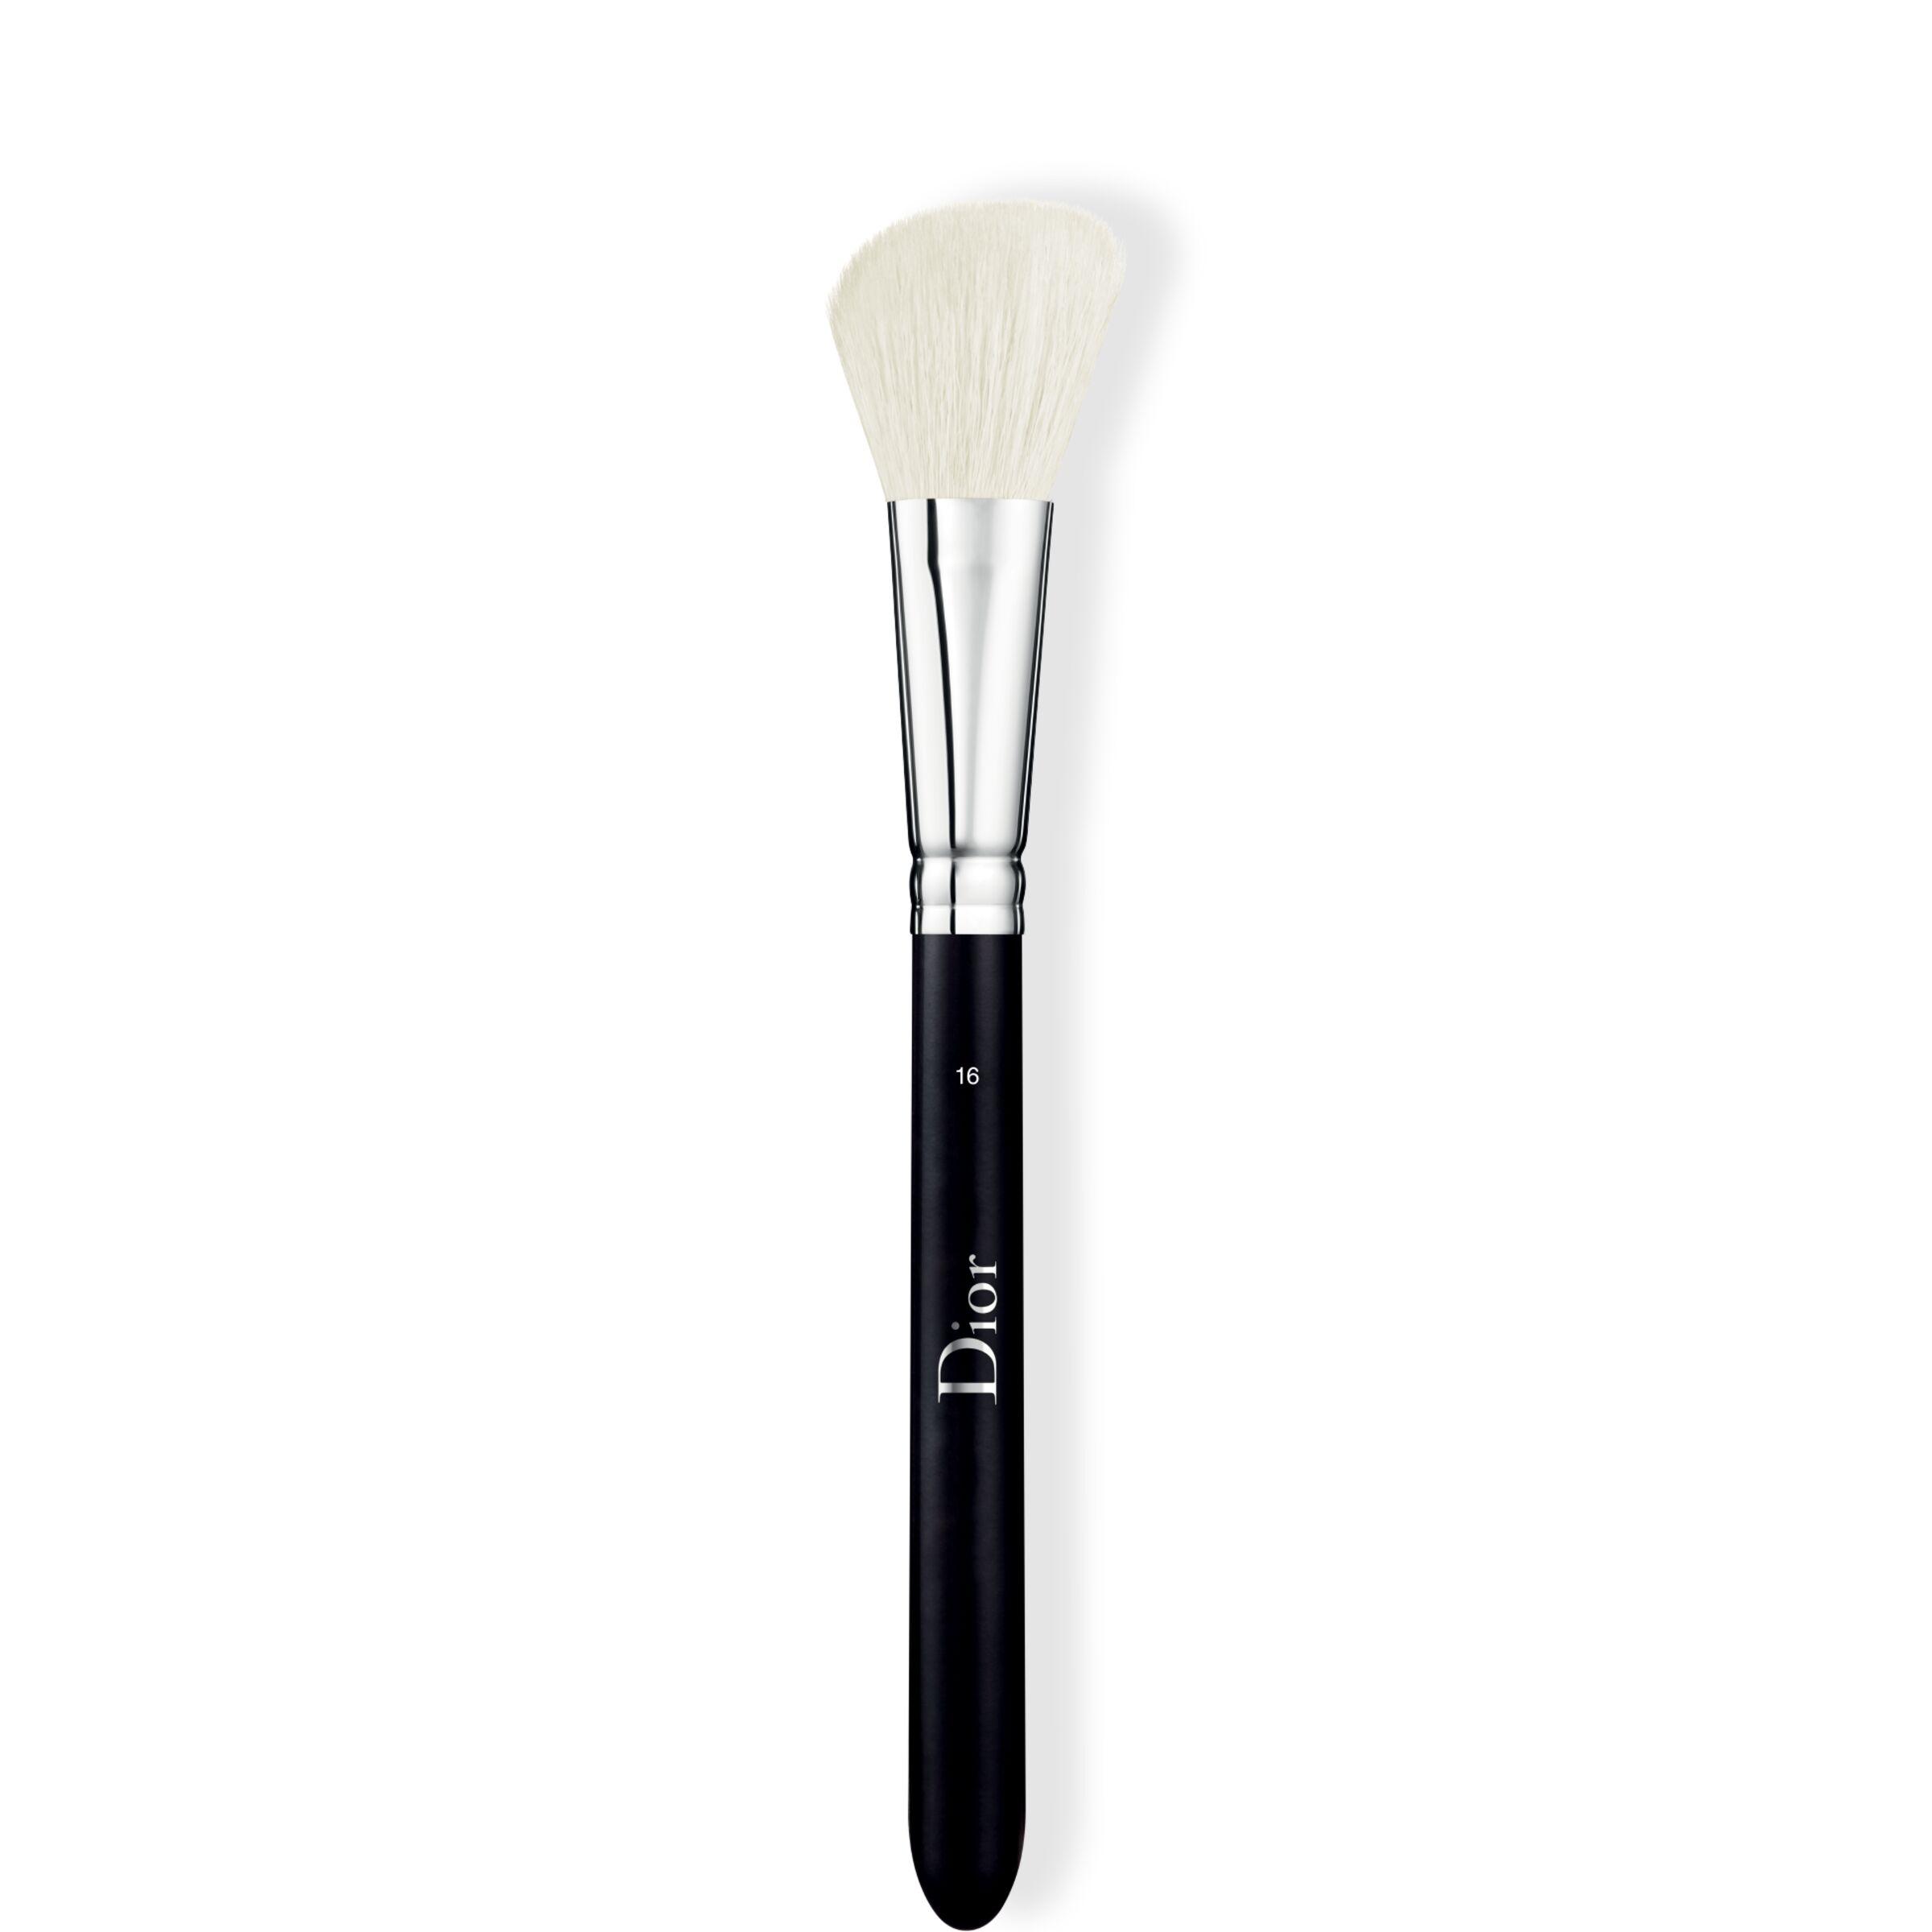 Dior Backstage Blush Brush N°16